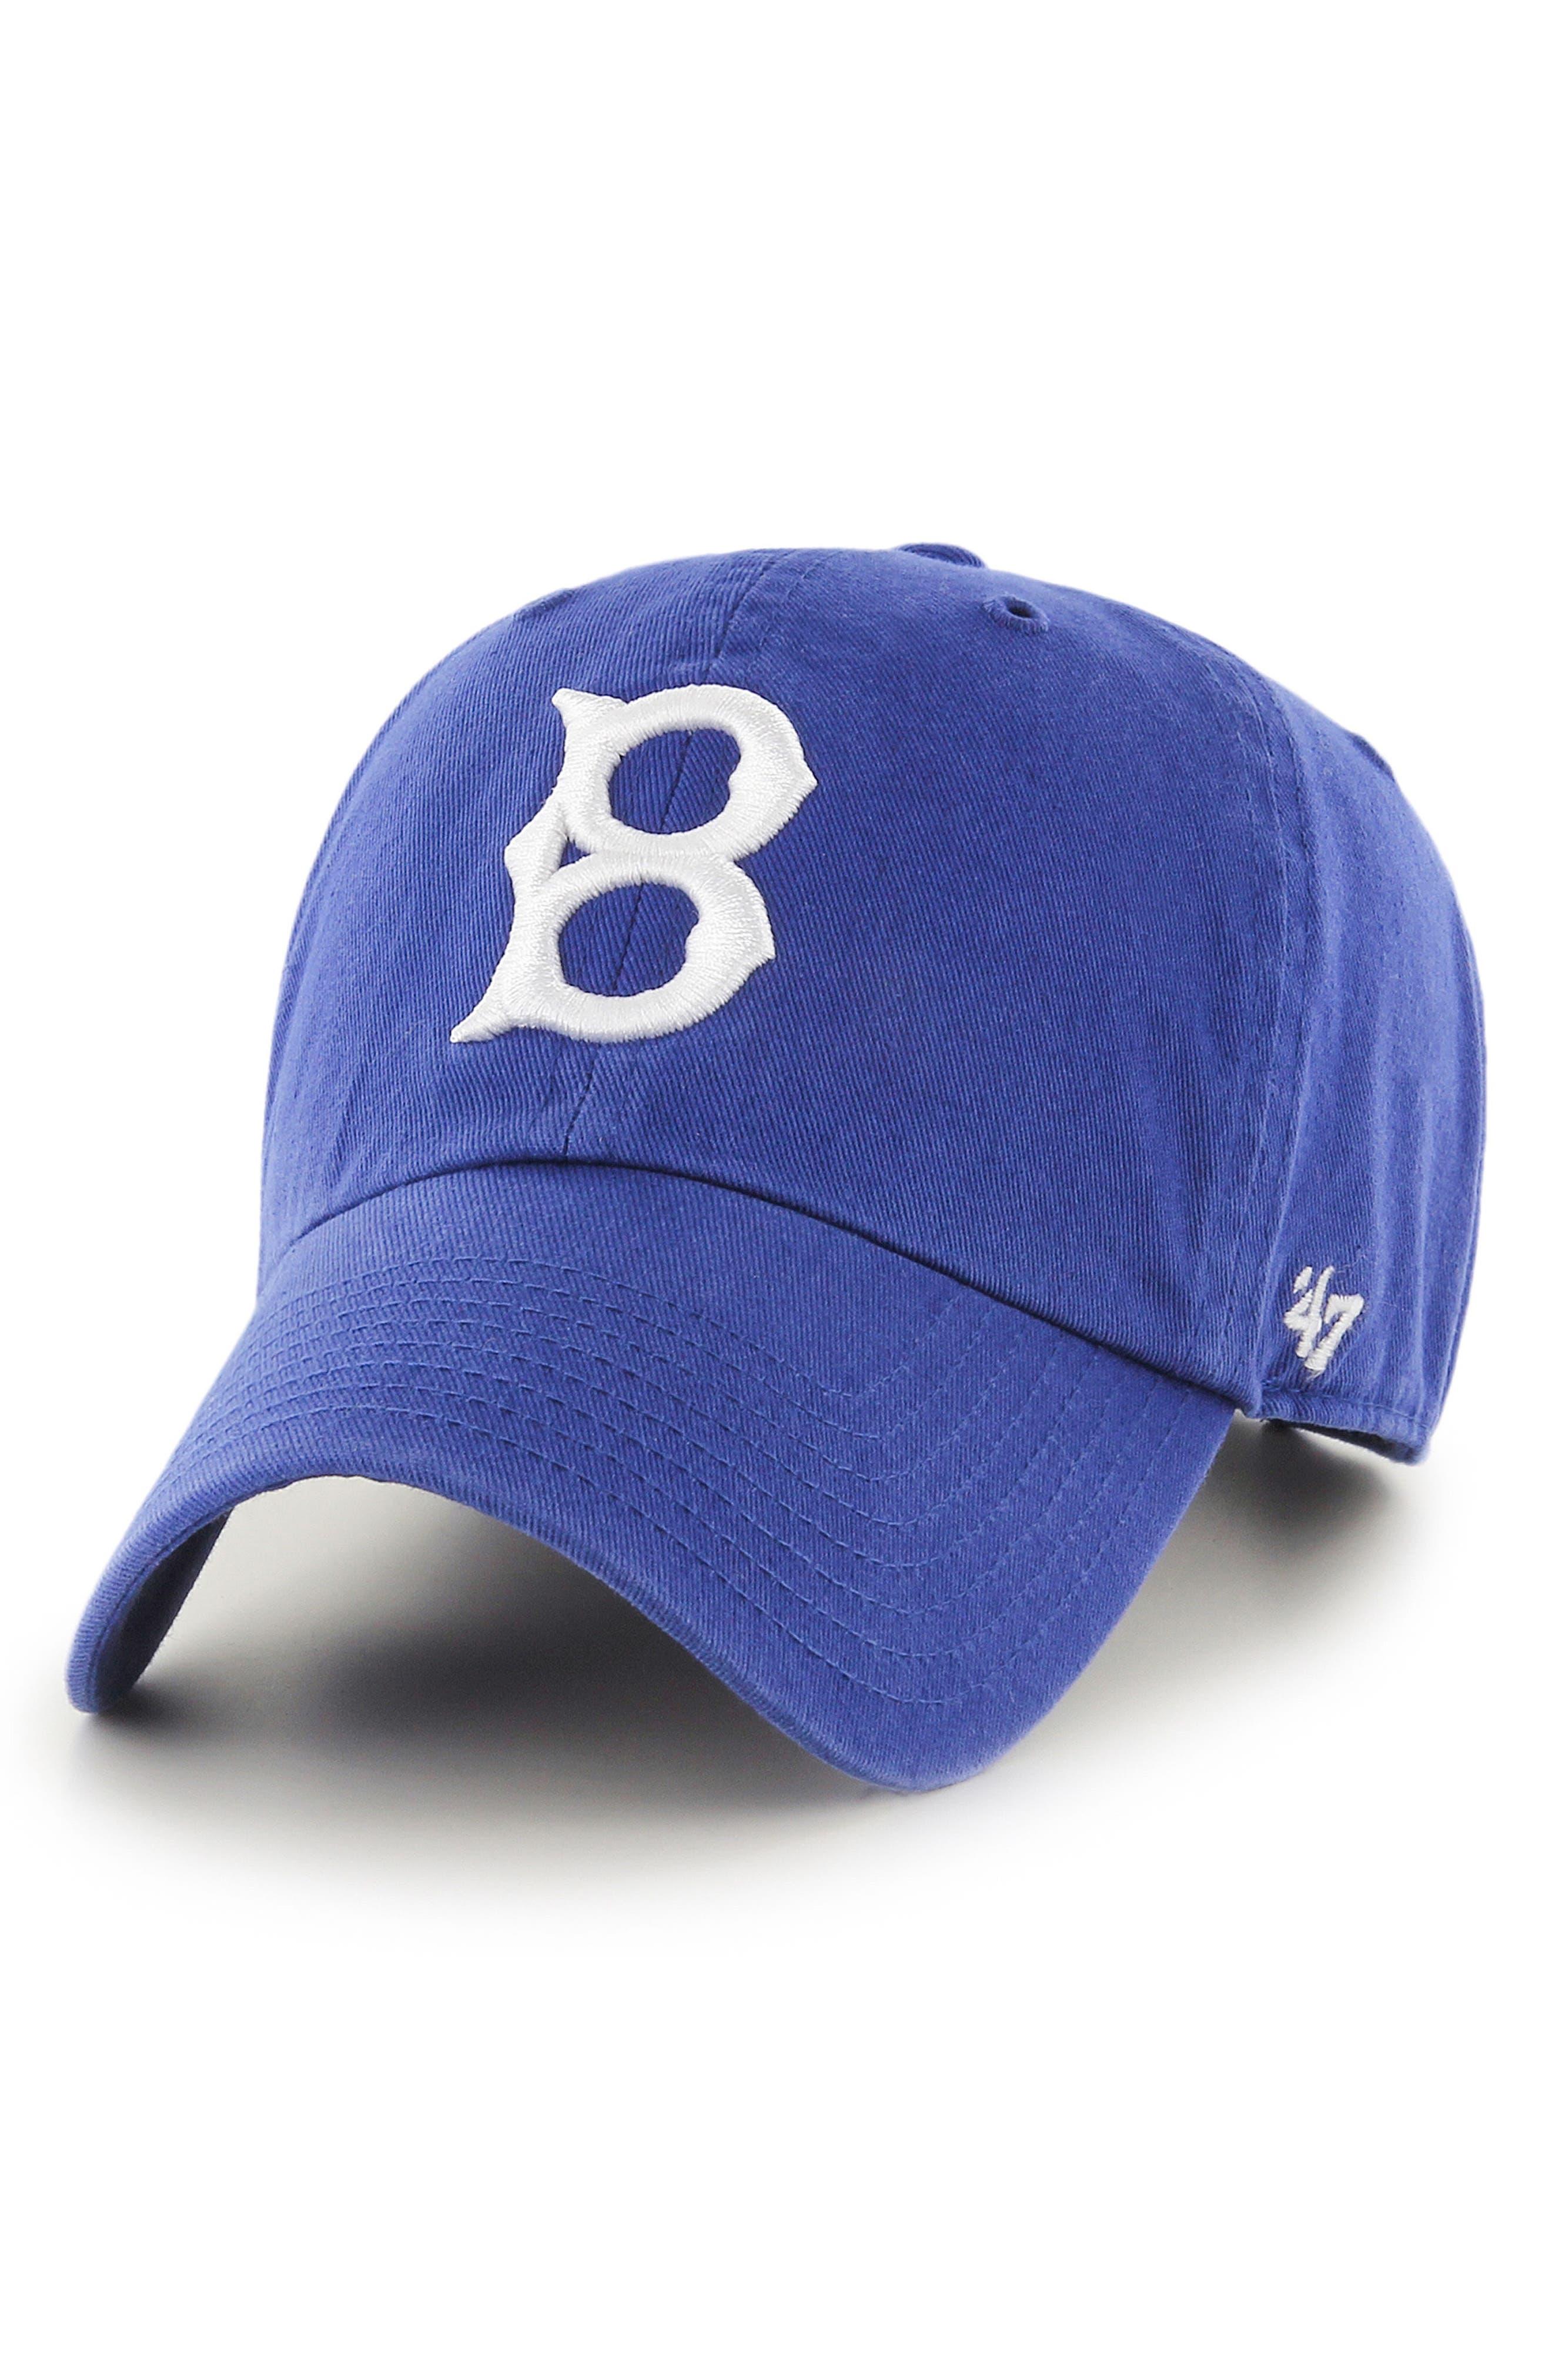 MLB Cooperstown Logo Ball Cap,                             Main thumbnail 2, color,